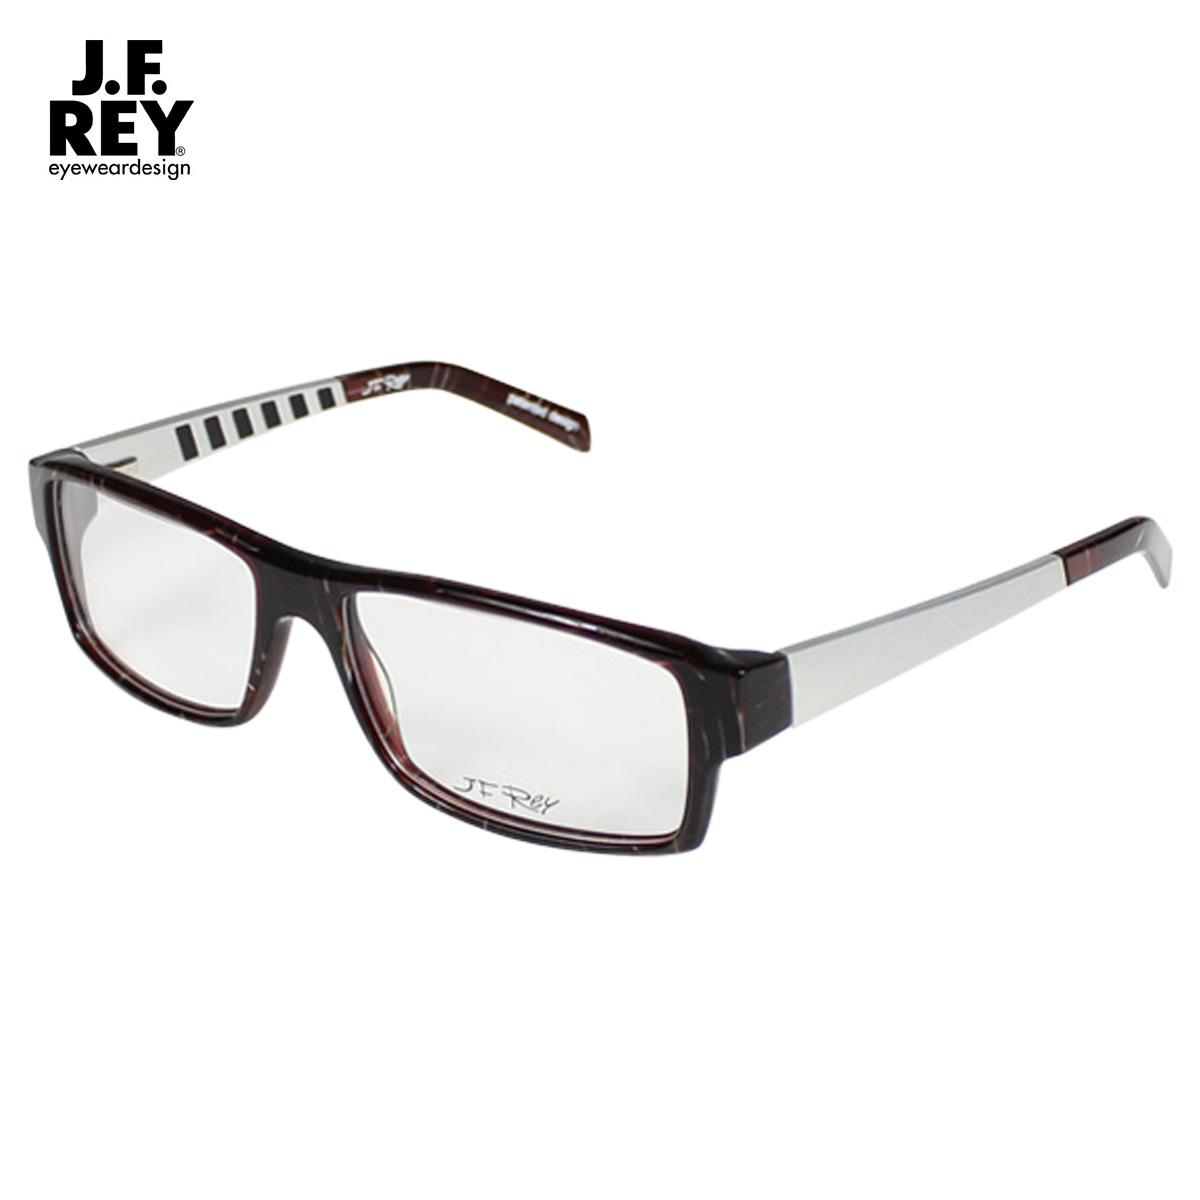 J.F.REY ジェイエフレイ メンズ メガネ 眼鏡 眼鏡 メンズ ジェイエフレイ レディース, ワケグン:3359cad5 --- gamenavi.club